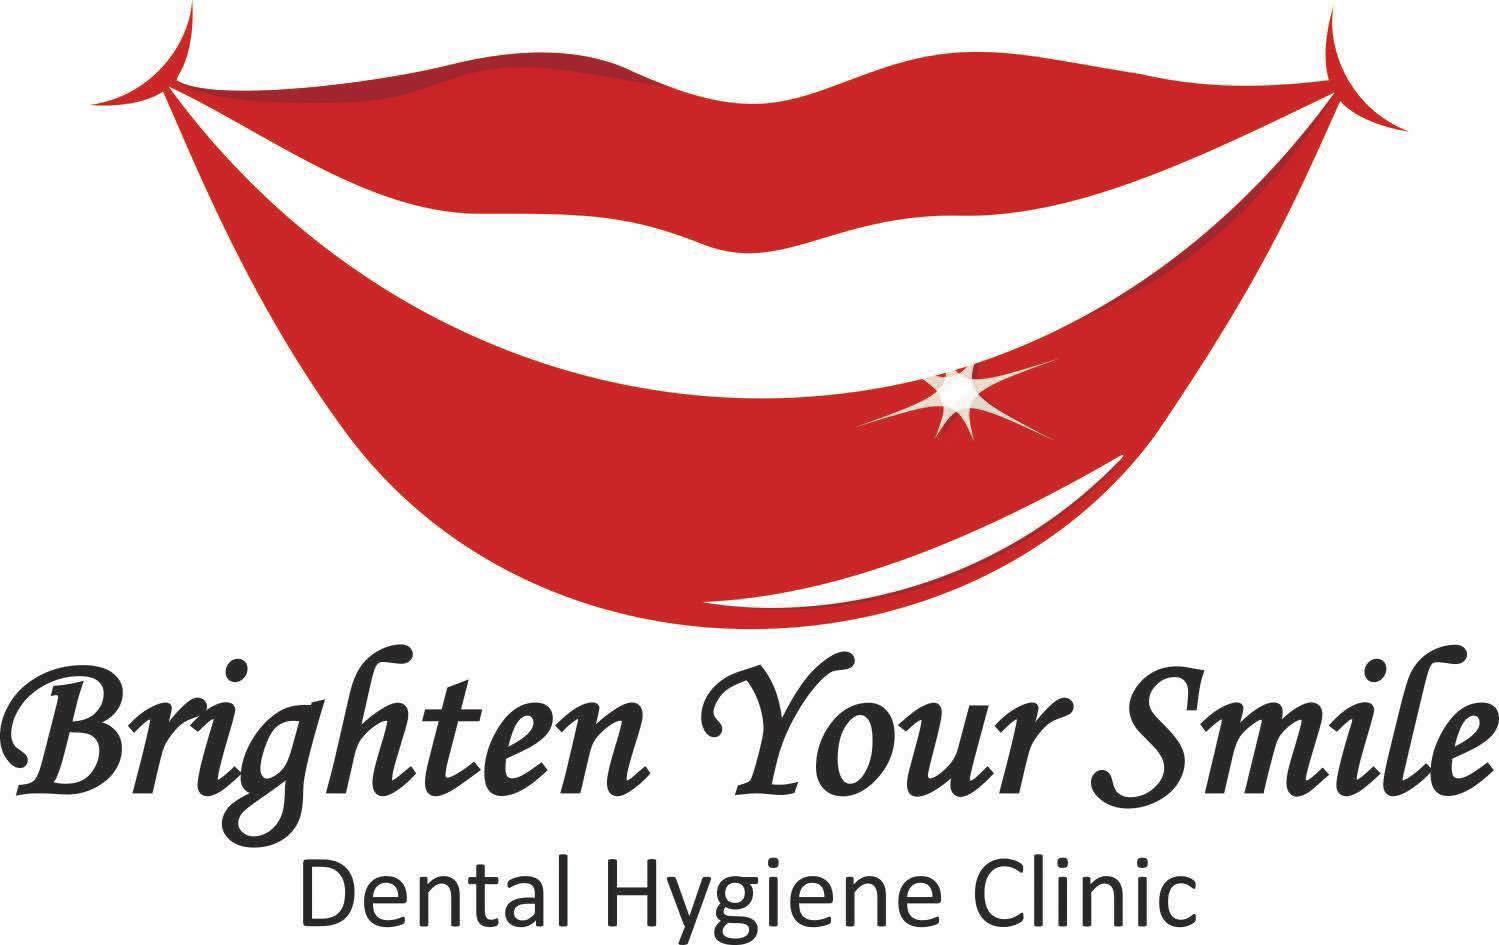 Brighten Your Smile Dental Hygiene Clinic